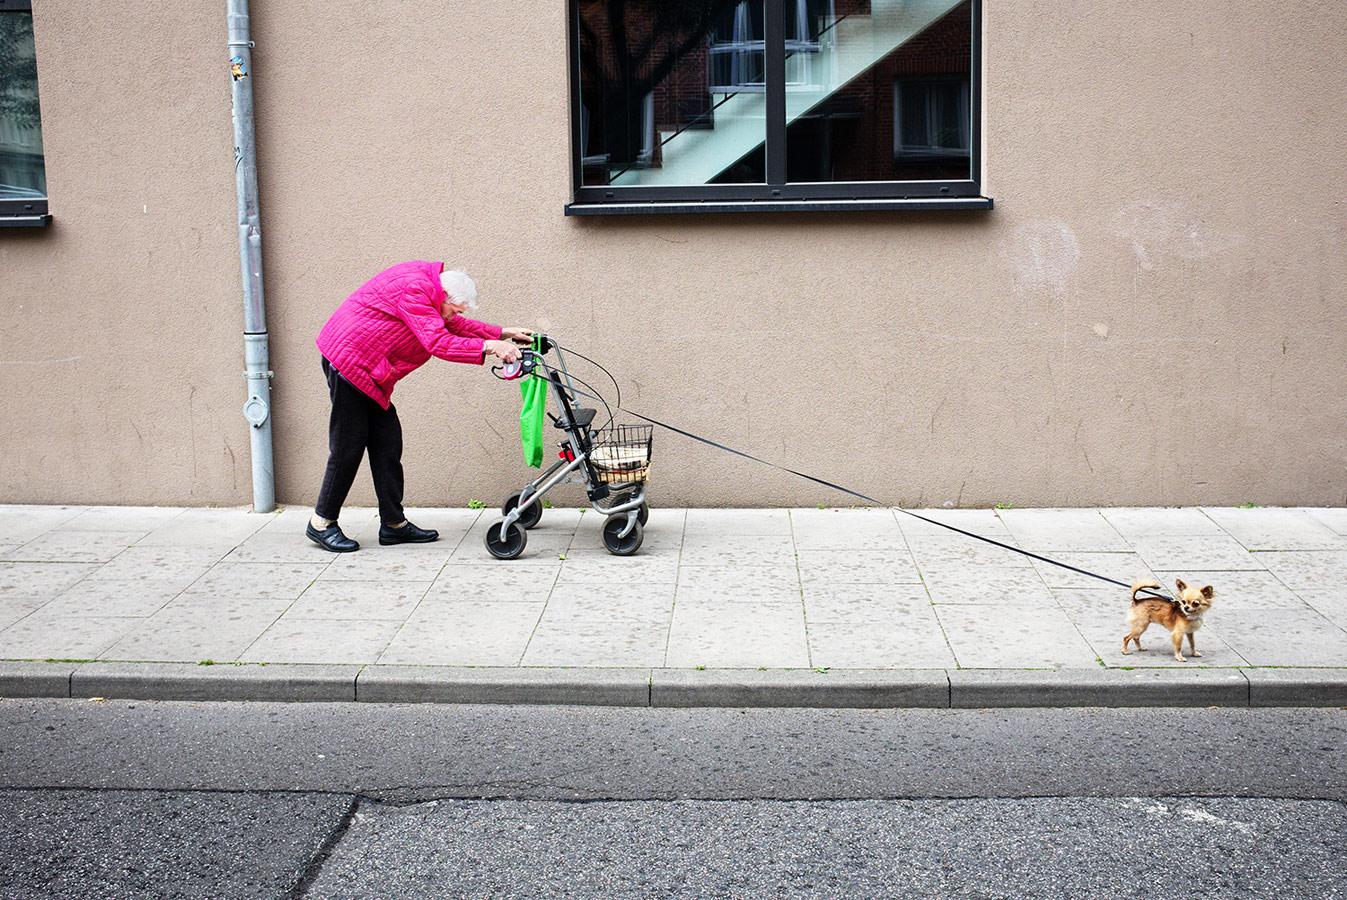 © Manuel Armenis, Germany, Winner, Open Street Photography and Winner, Germany National Award, Sony World Photography Awards